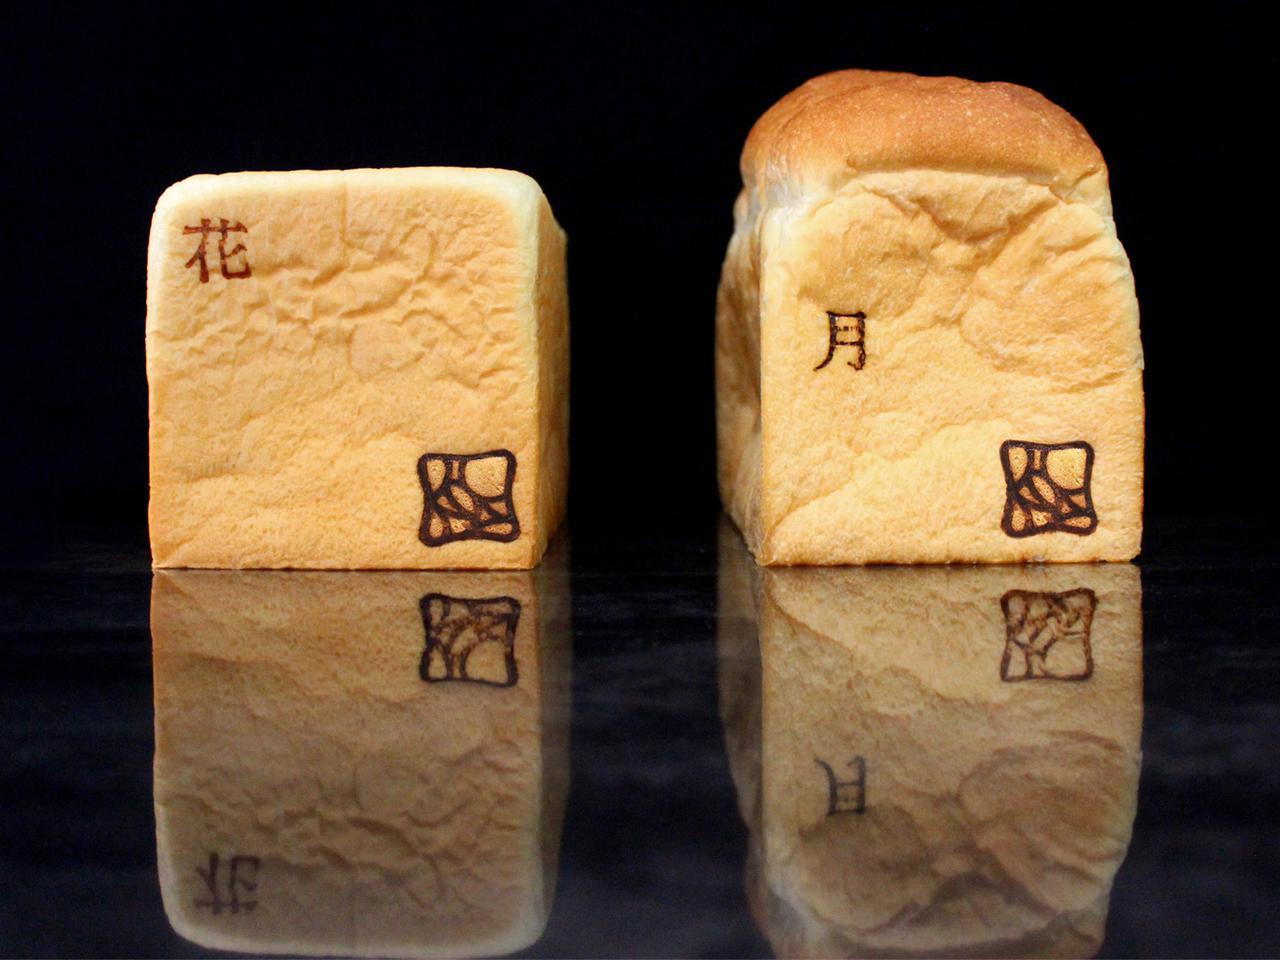 画像: 高級食パン専門店|究極の贅沢|兵庫・宝塚|KONA TKZ